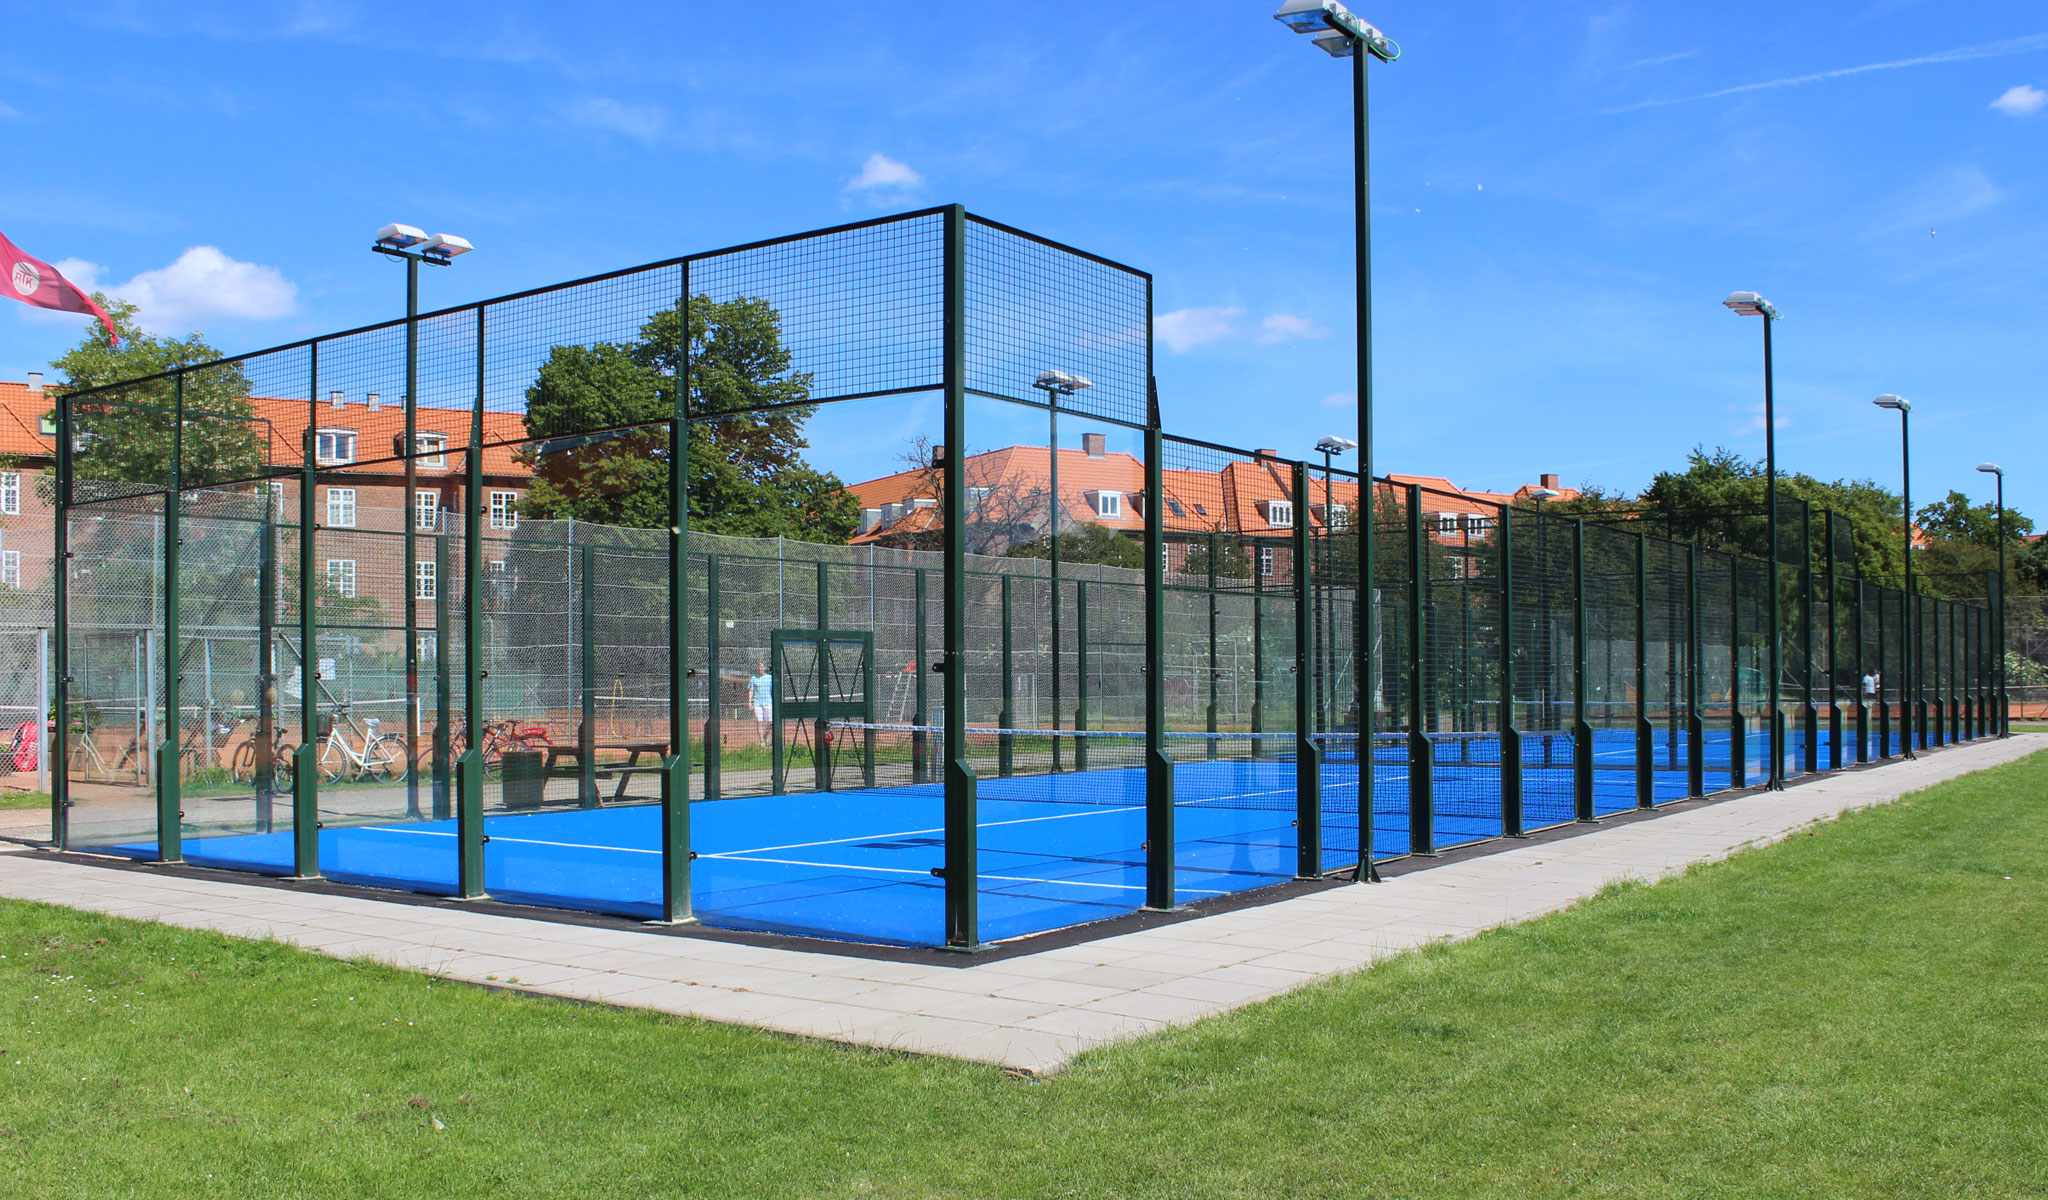 padel padelbane padeltennis padel tennis grøndal multicenter unisport